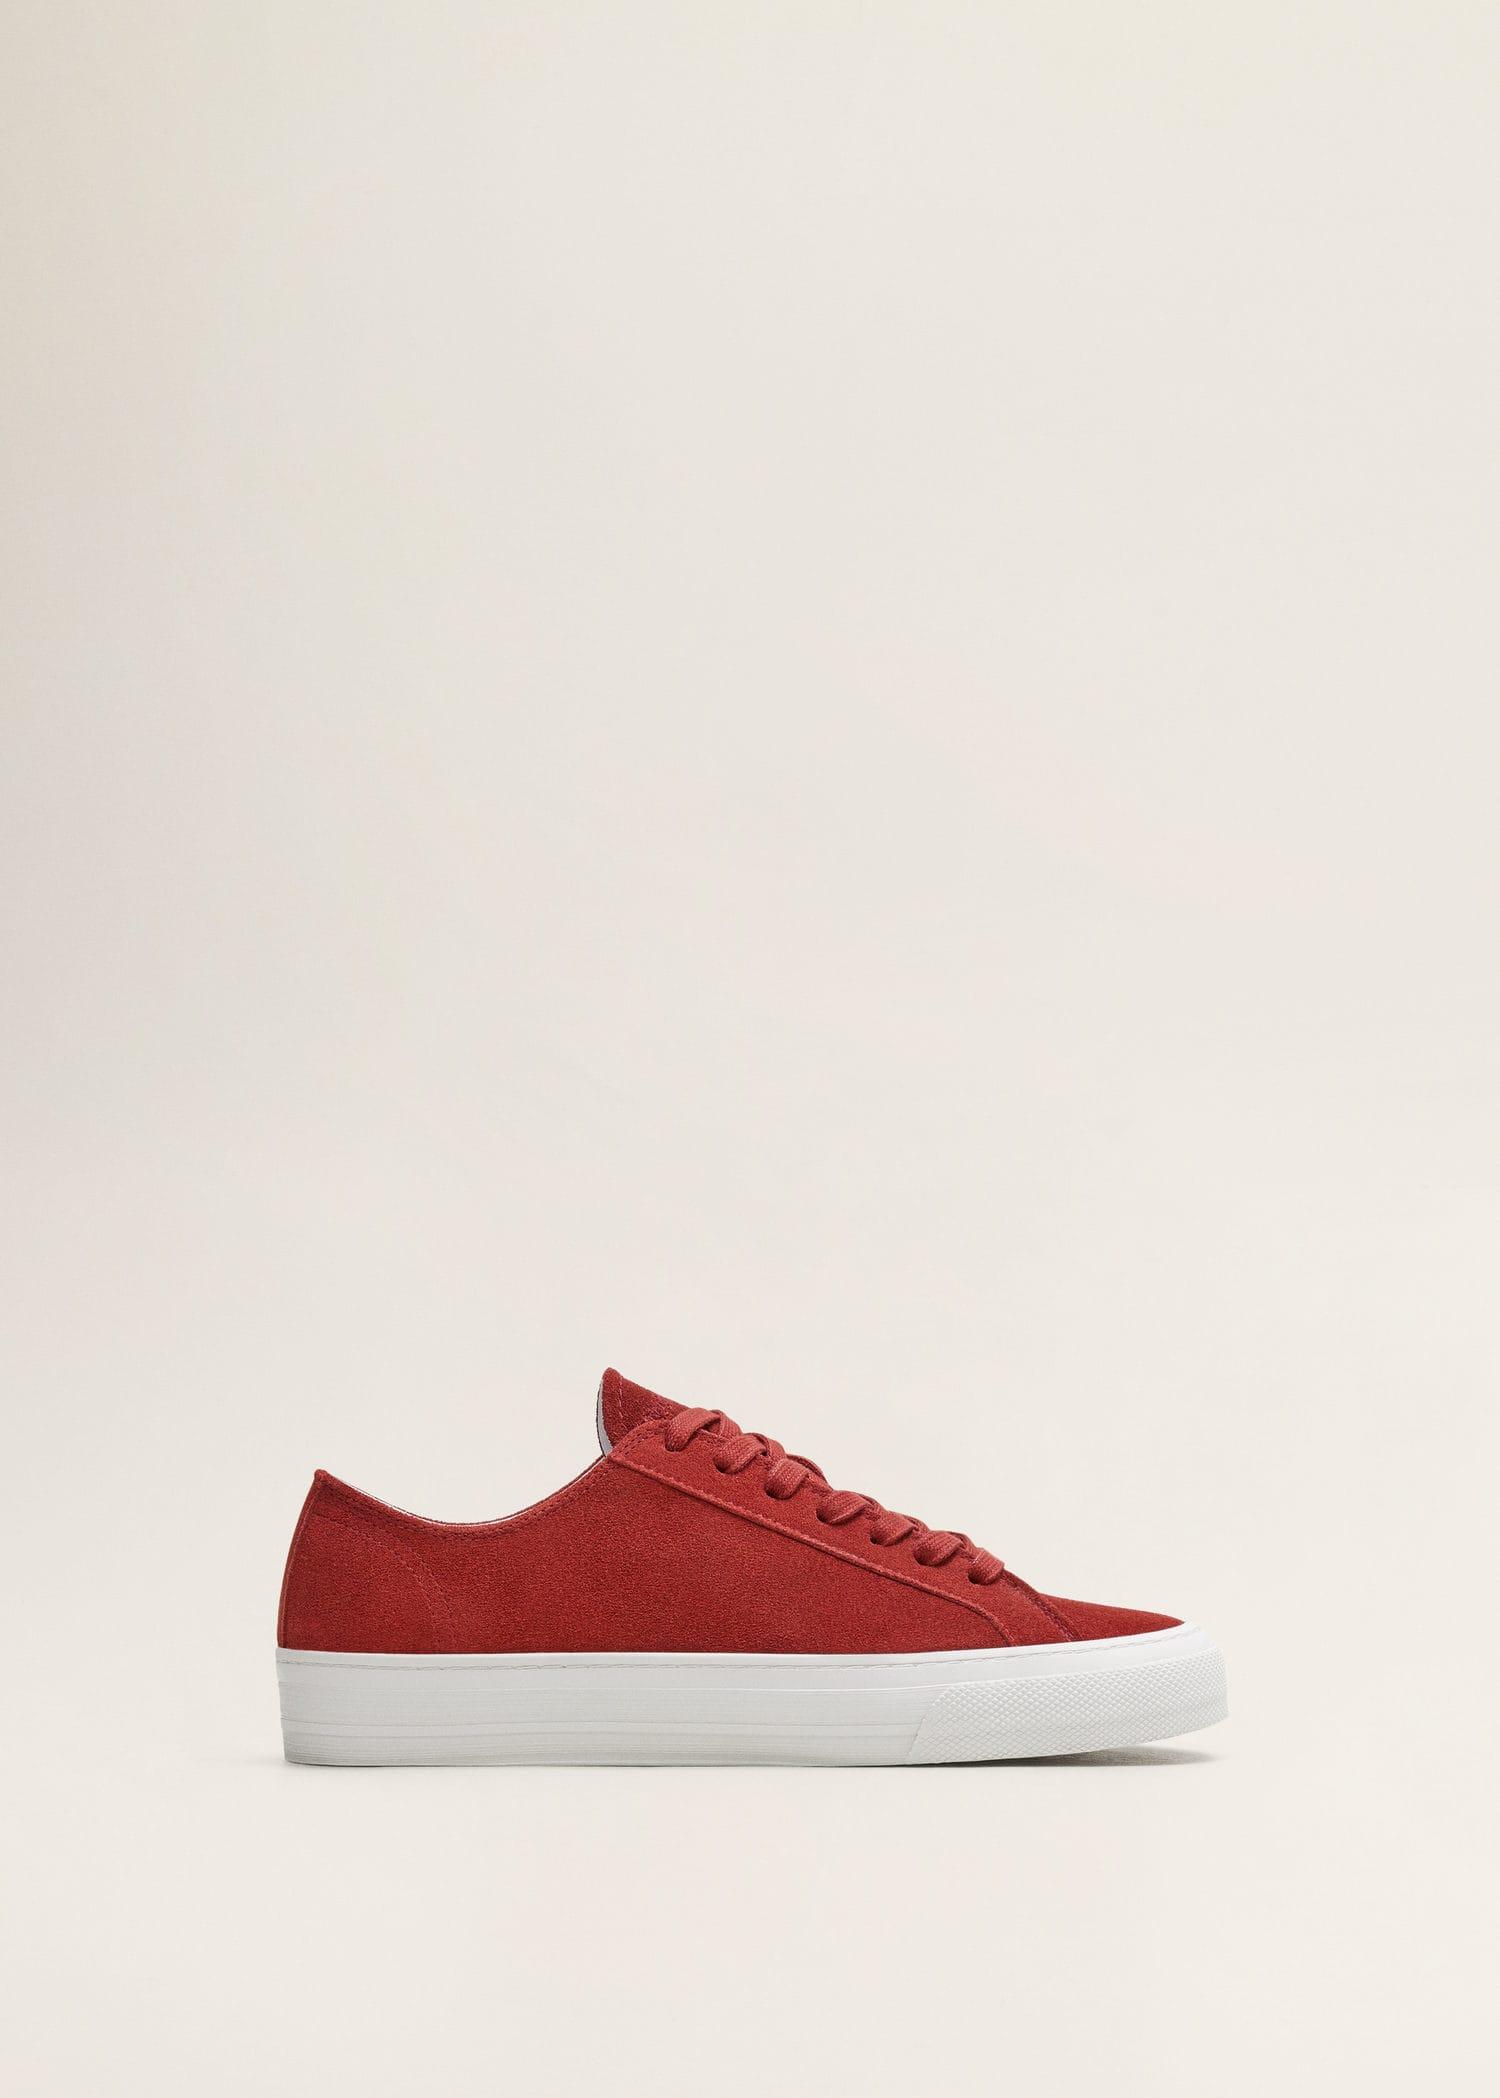 Shoes - Men | OUTLET USA